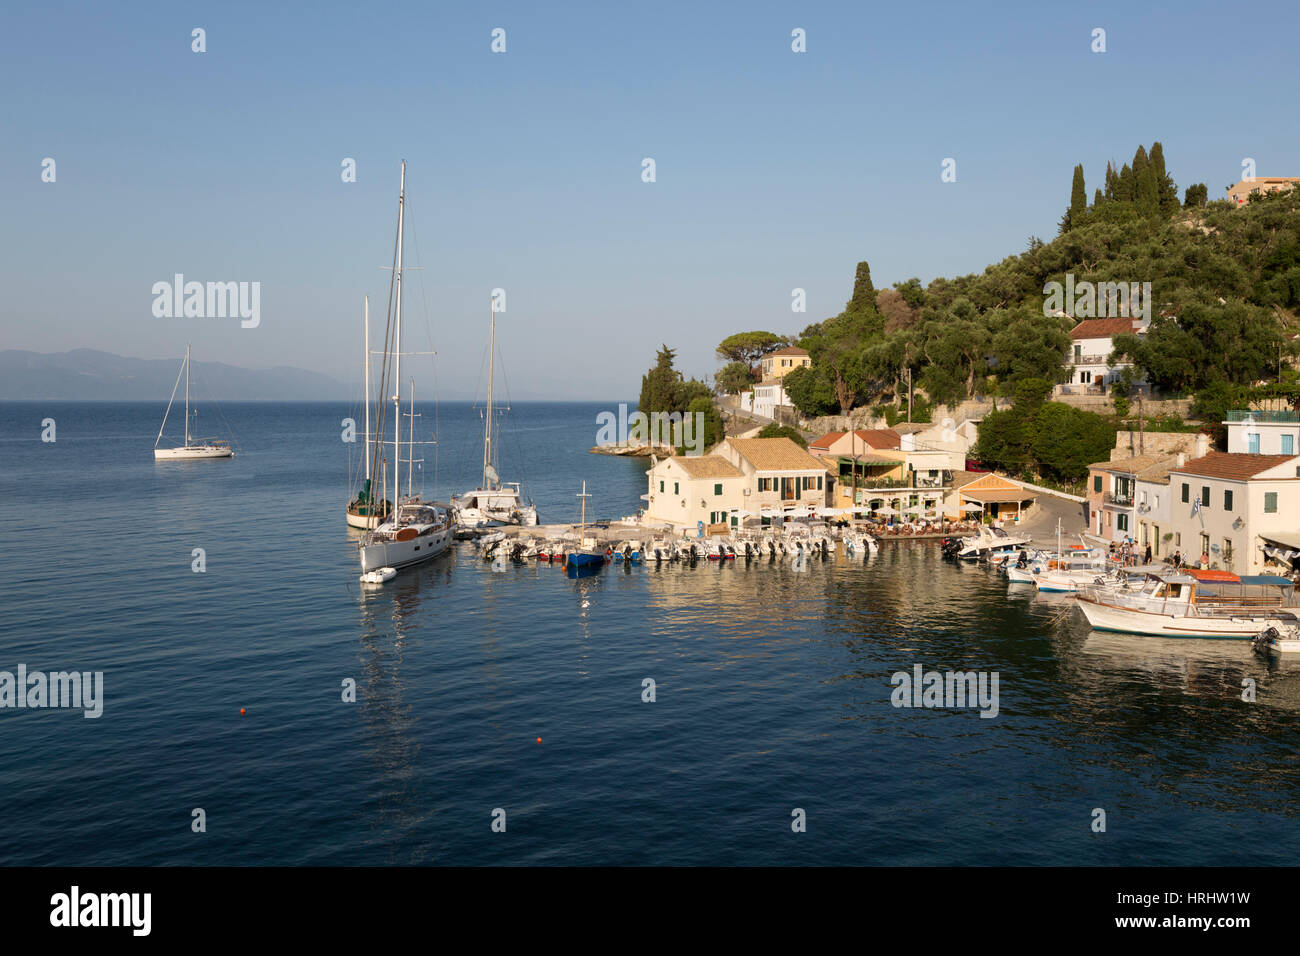 View over harbour, Loggos, Paxos, Ionian Islands, Greek Islands, Greece Stock Photo